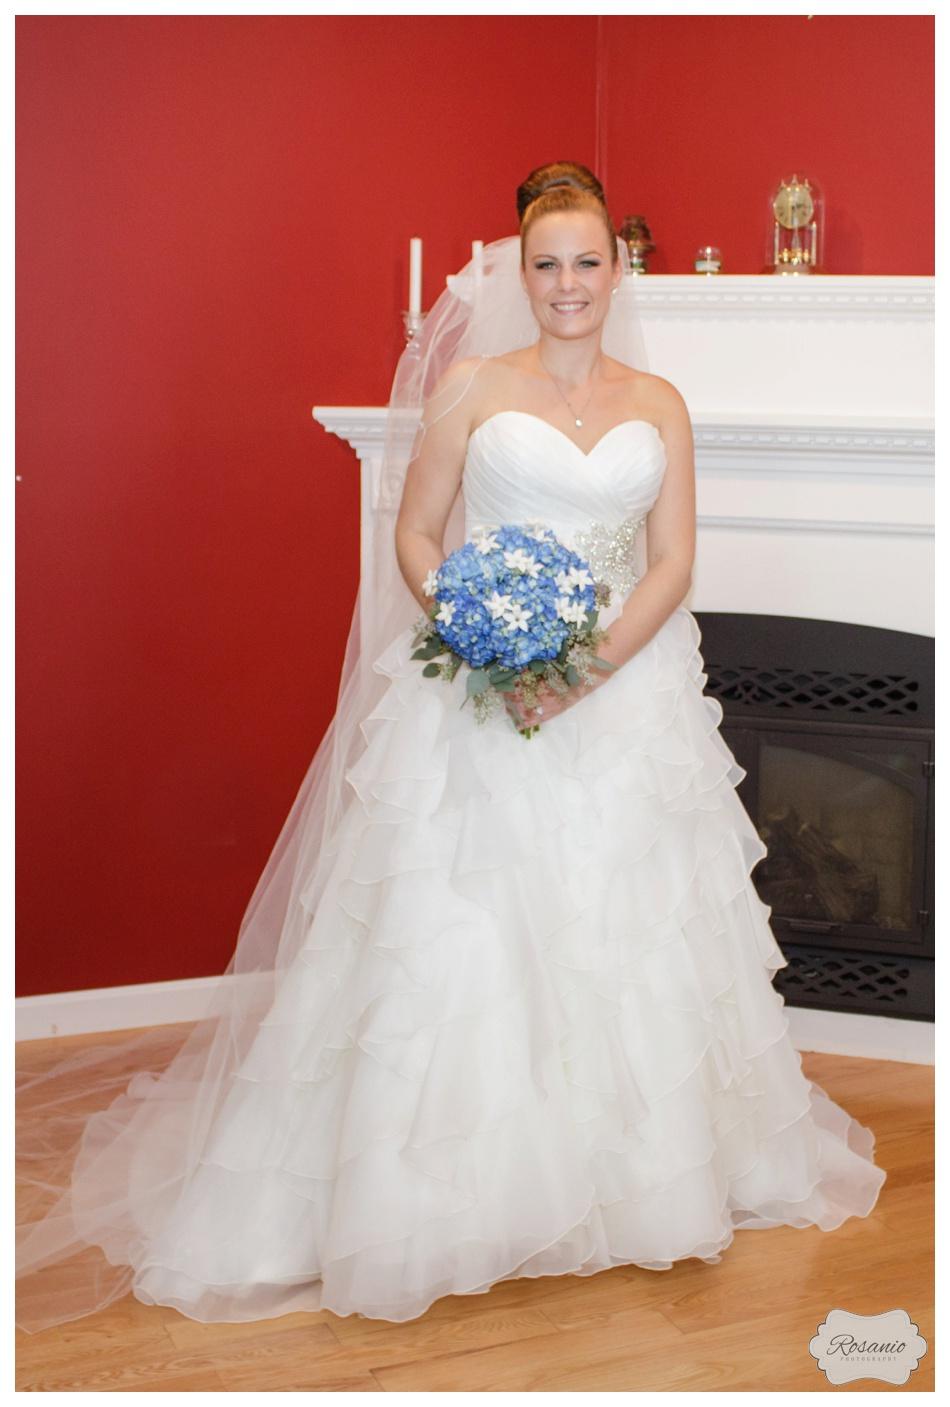 Rosanio Photography | Diburro's Haverhill MA | Massachusetts Wedding Photographer_0020.jpg